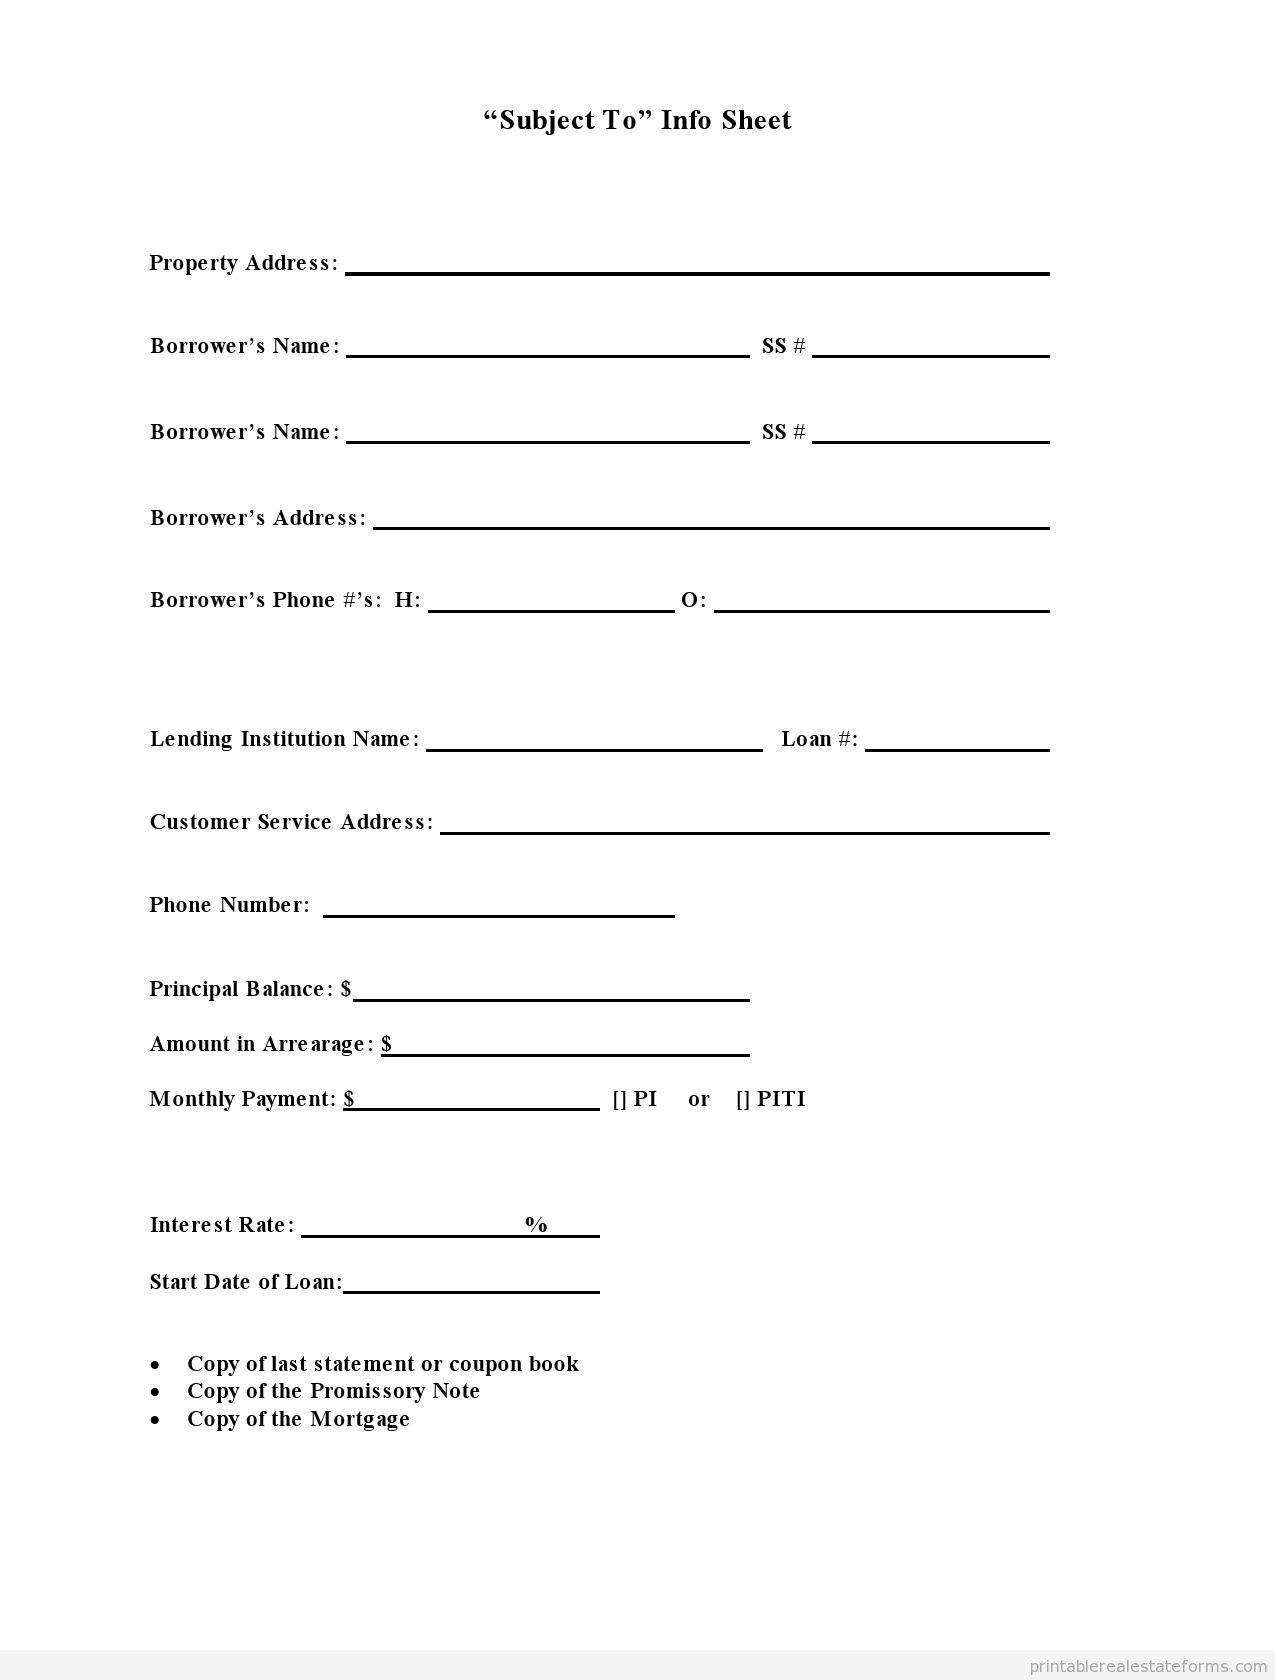 Sample Printable Subject To Info Sheet Form